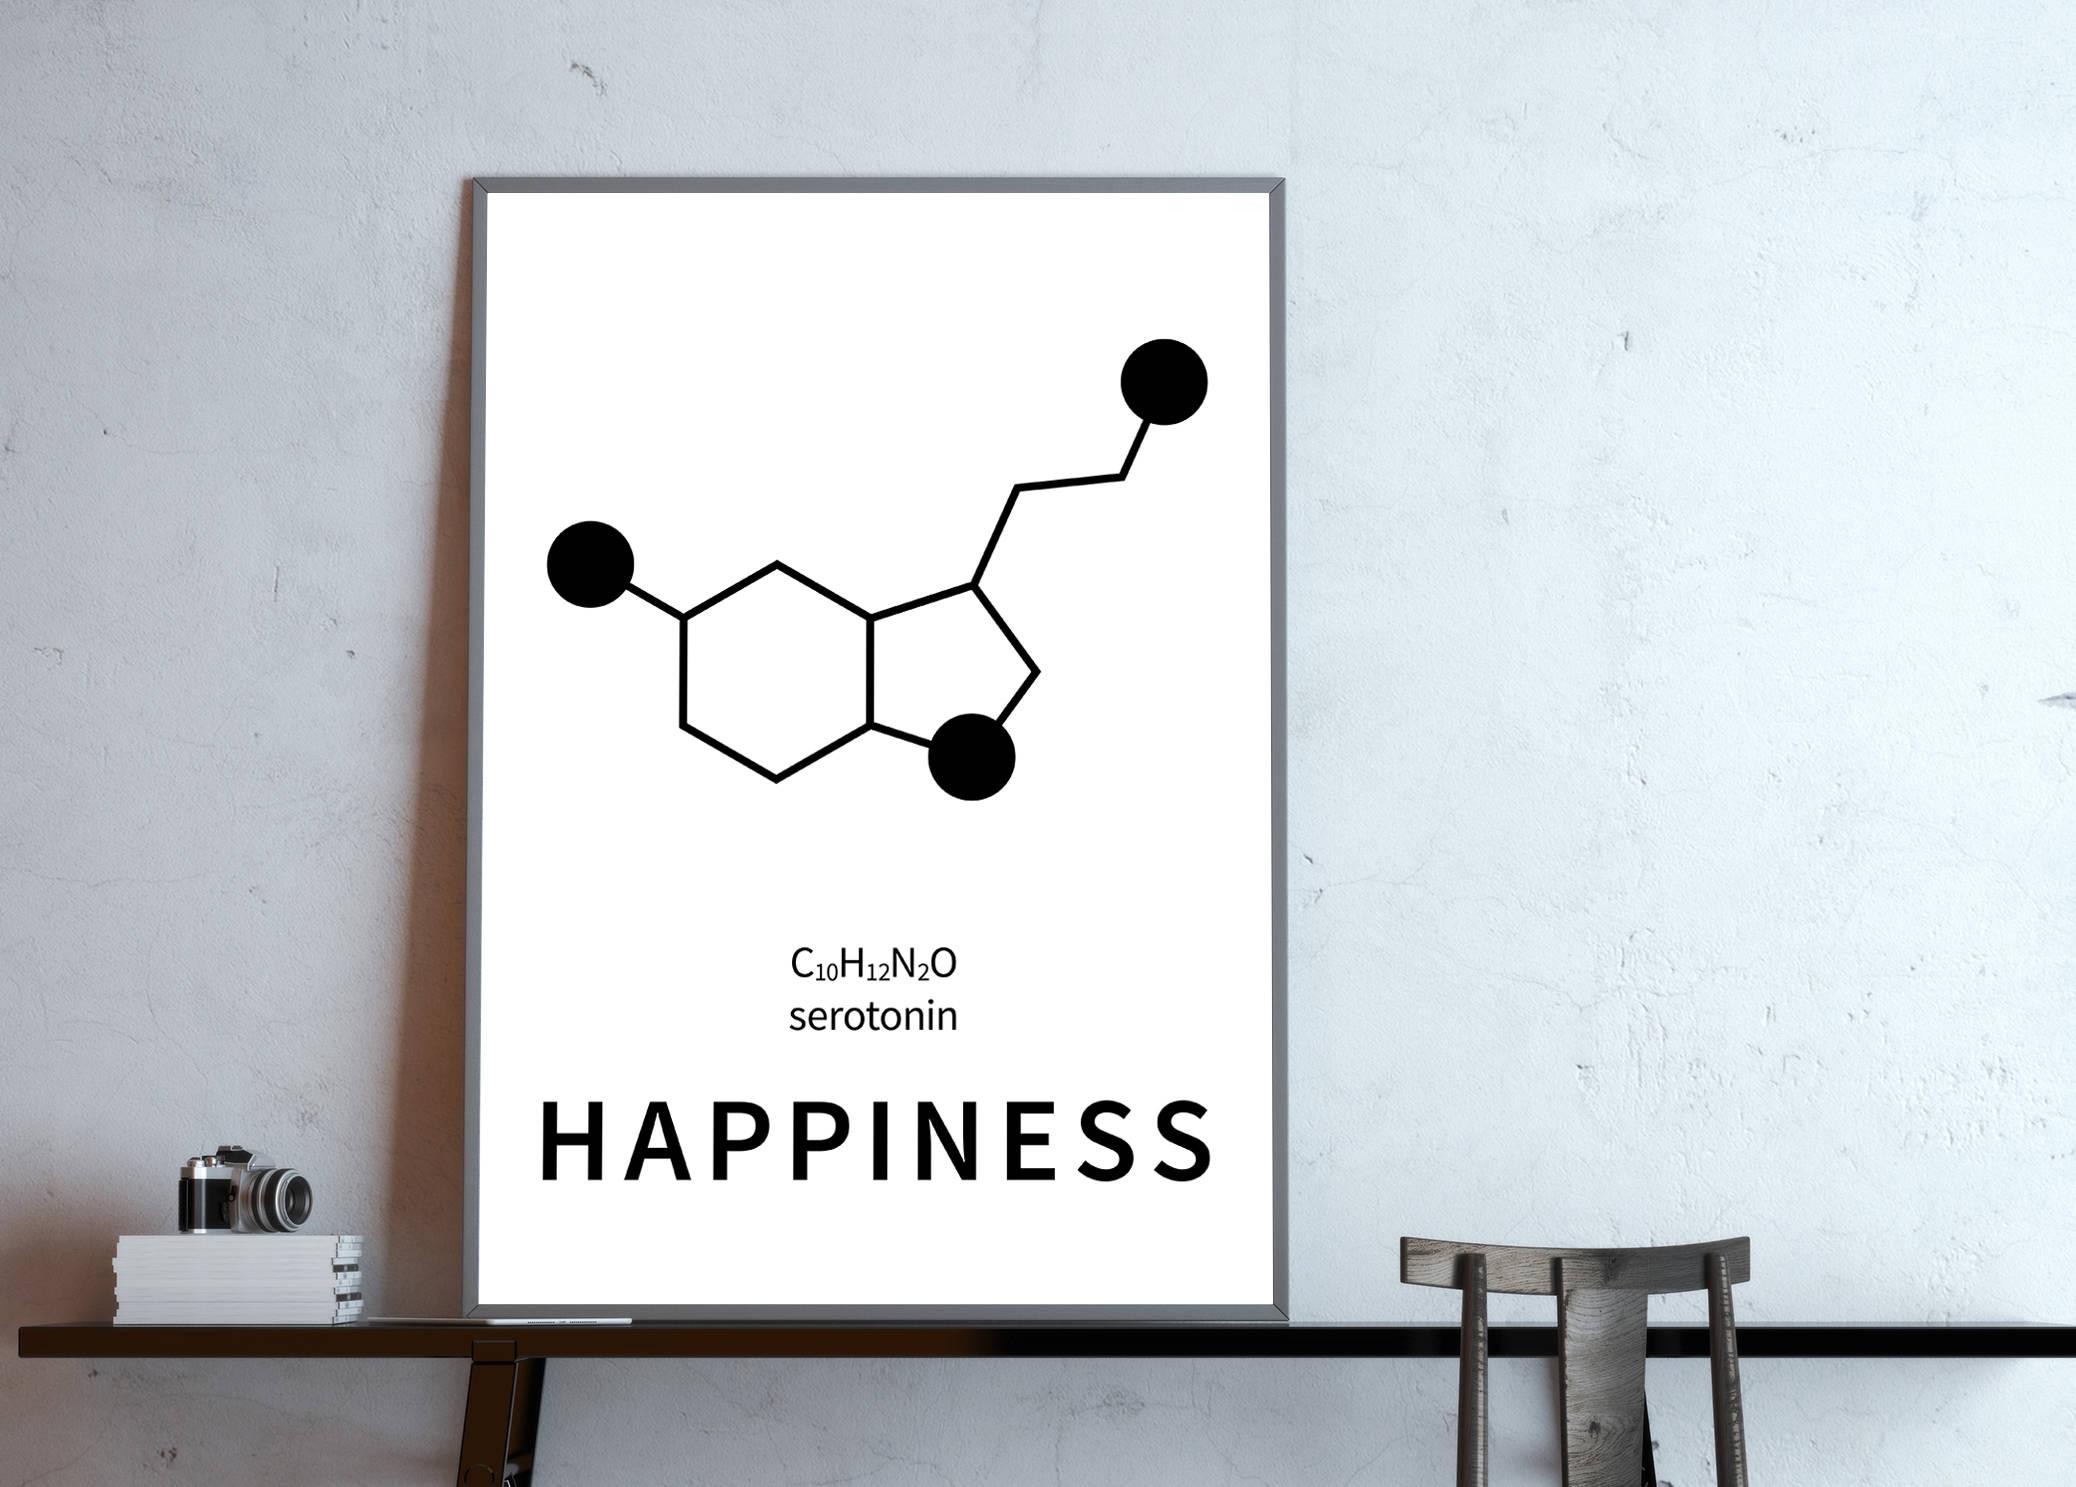 Poster: happiness serotonin structural formula molecular